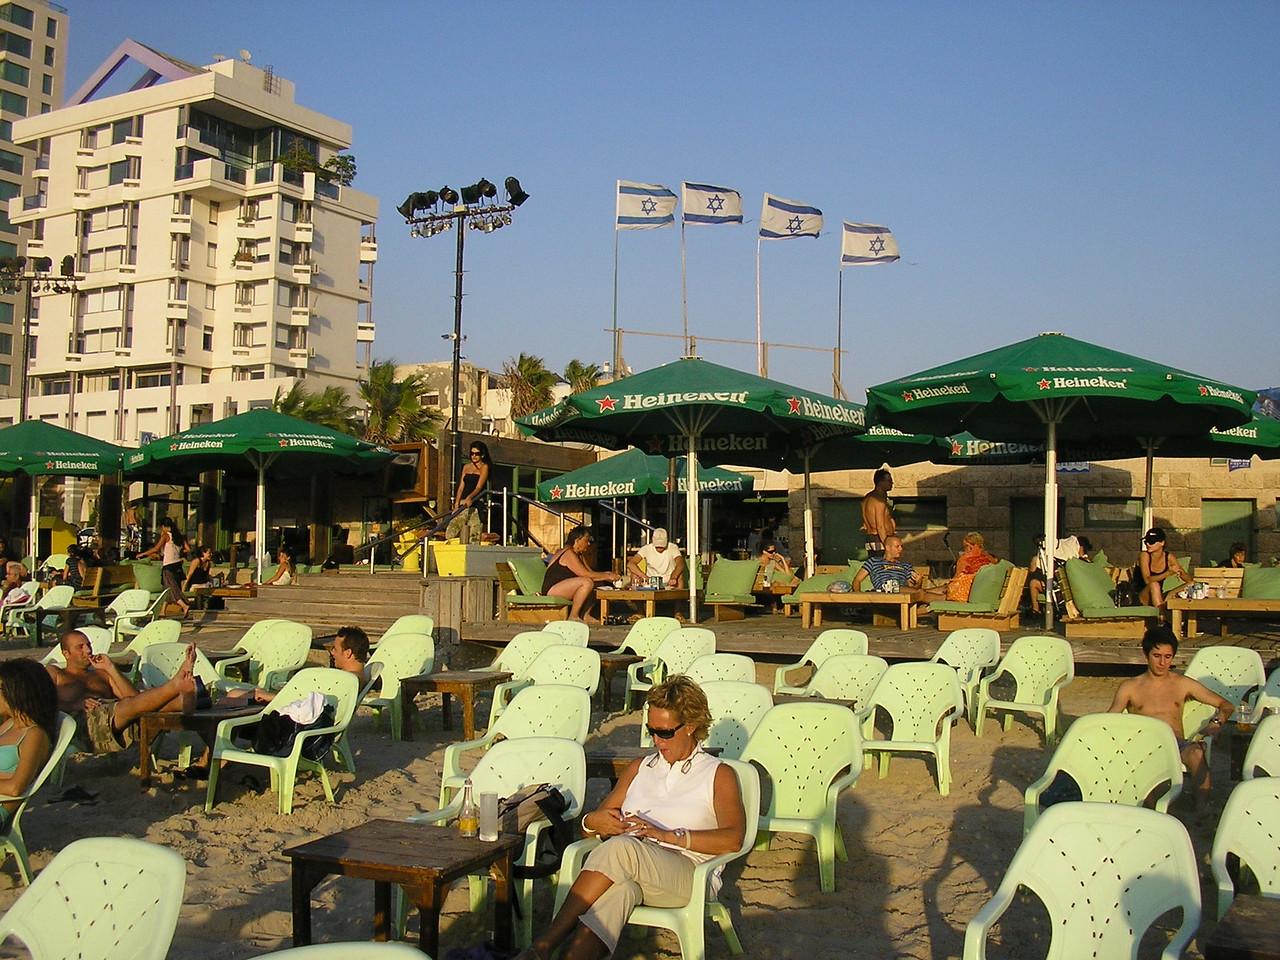 Sun Worshipers at Bahama Beach